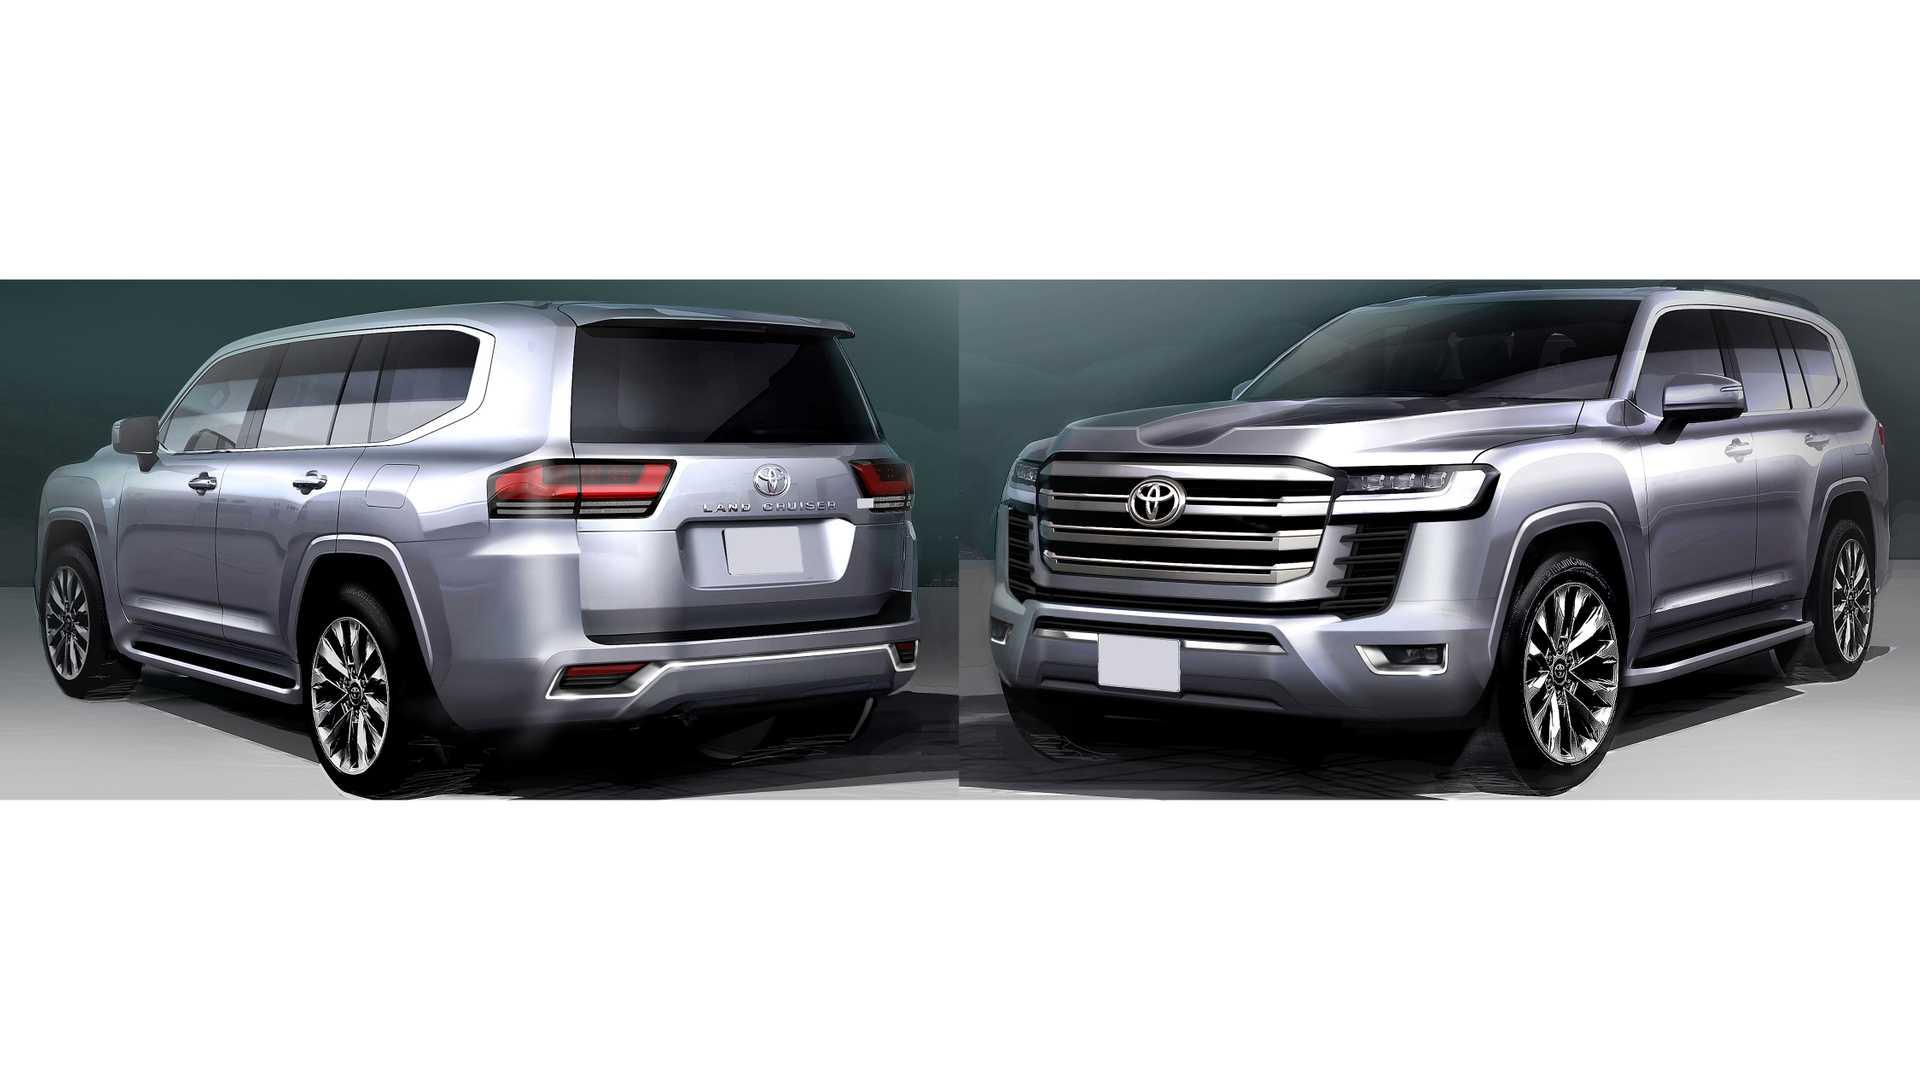 Toyota-Land-Cruiser-design-sketches-10